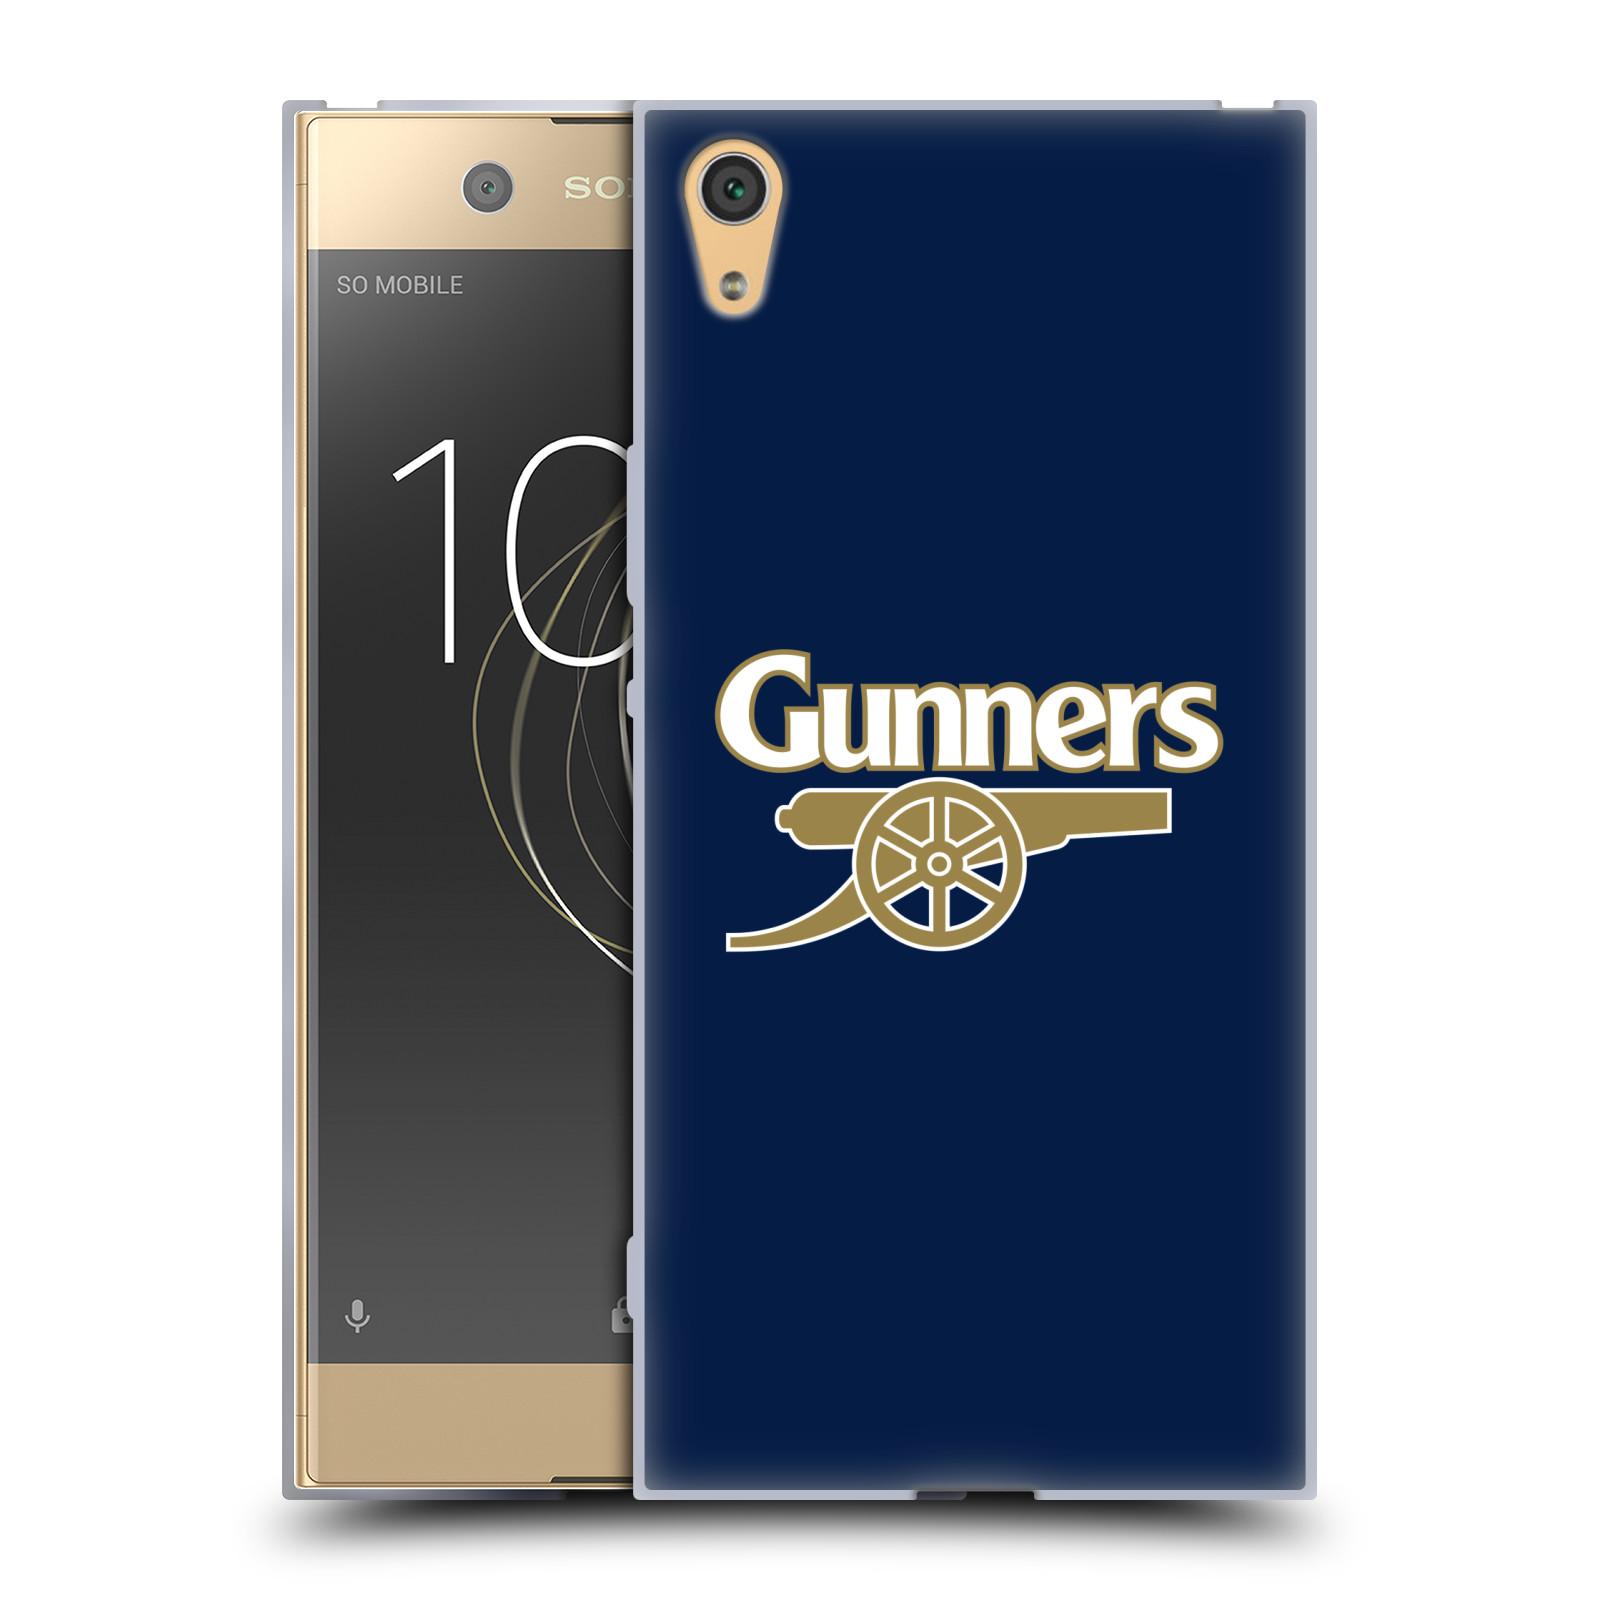 Silikonové pouzdro na mobil Sony Xperia XA1 Ultra - Head Case - Arsenal FC - Gunners